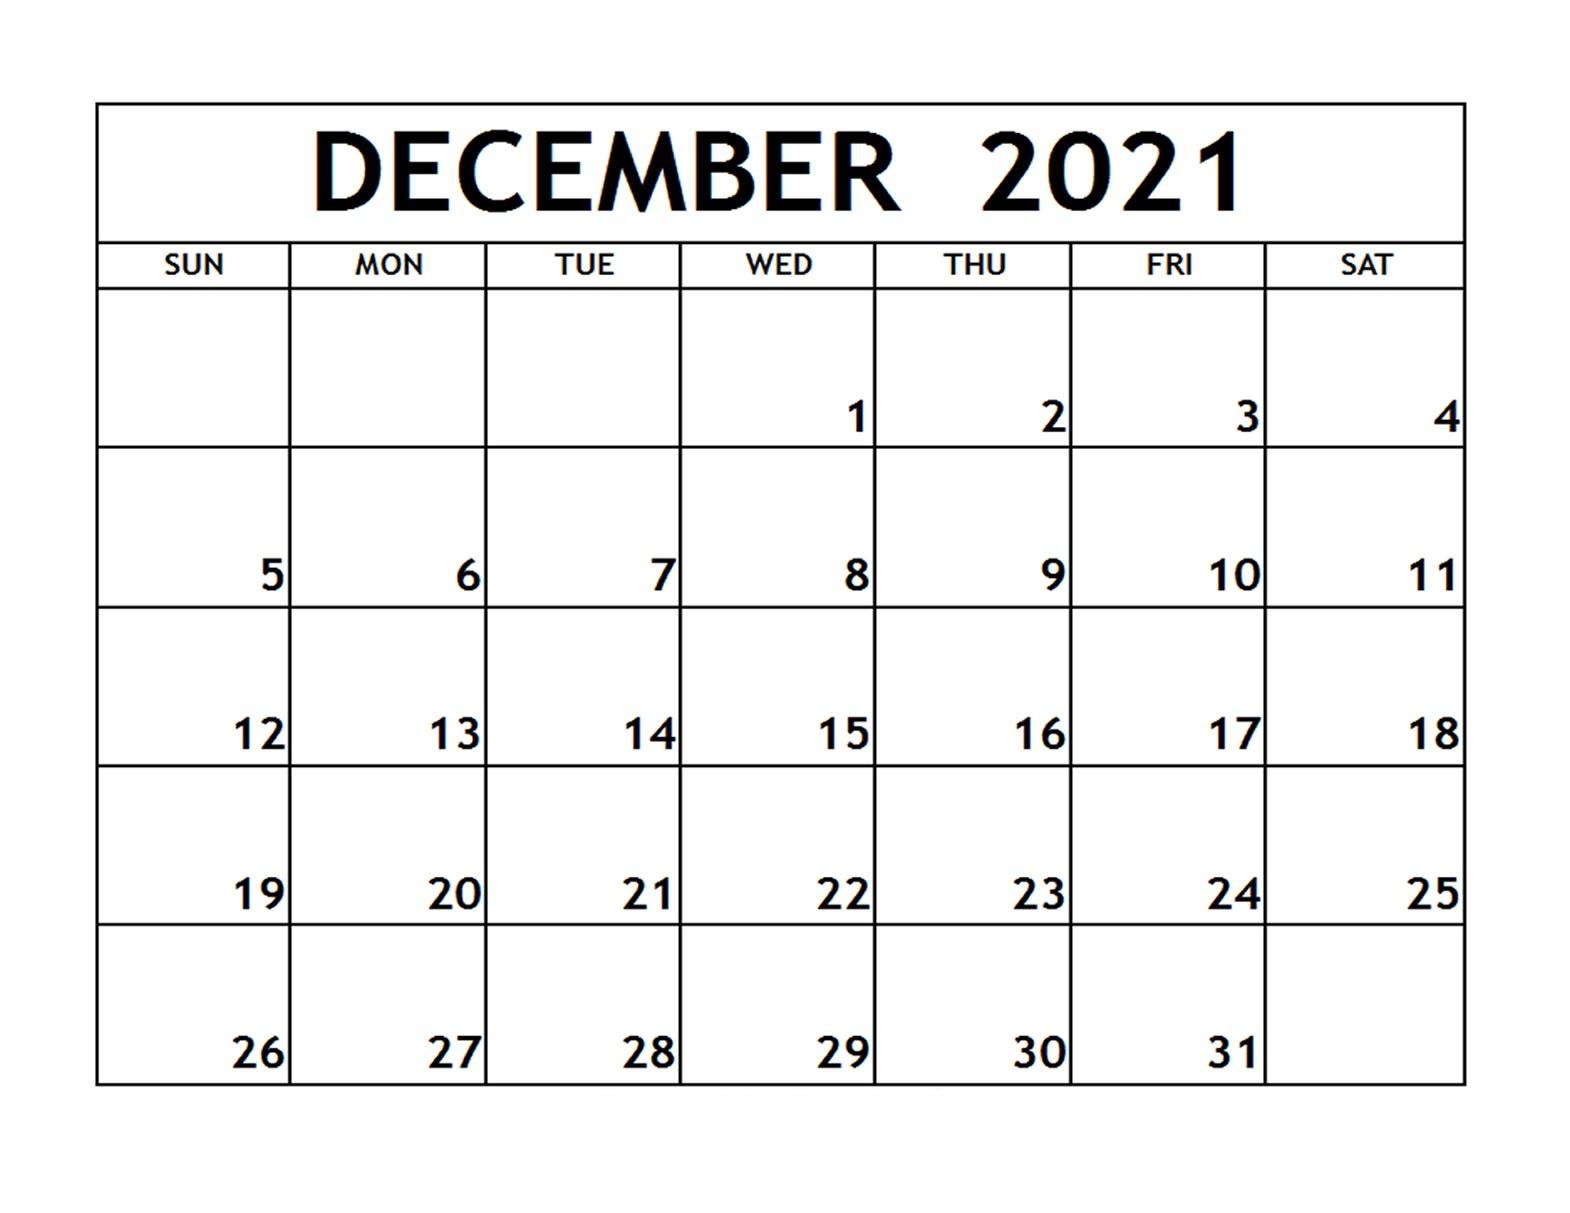 December 2021 Blank Calendar Landscape